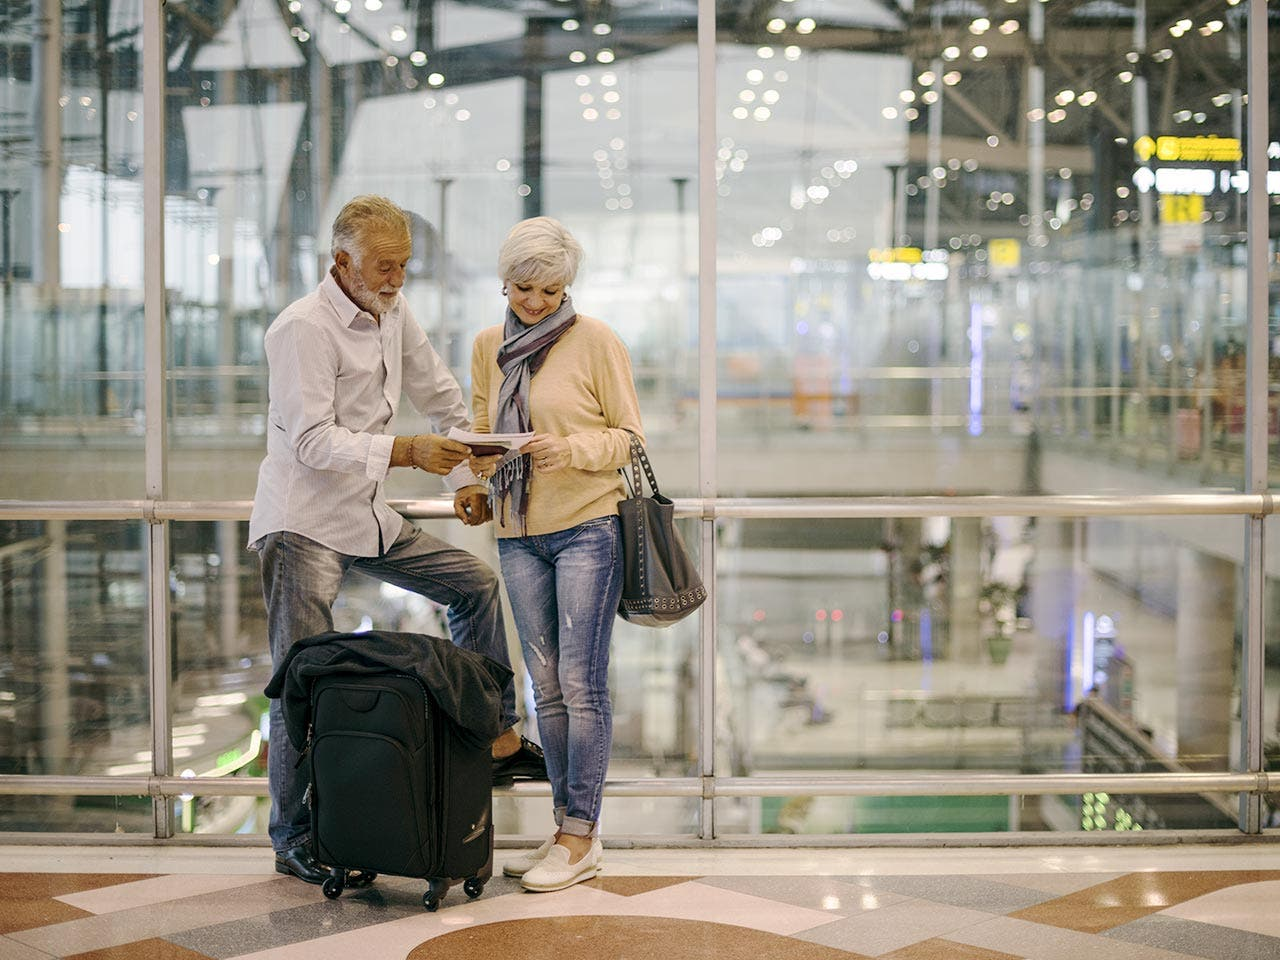 Luggage | Rawpixel.com/Shutterstock.com